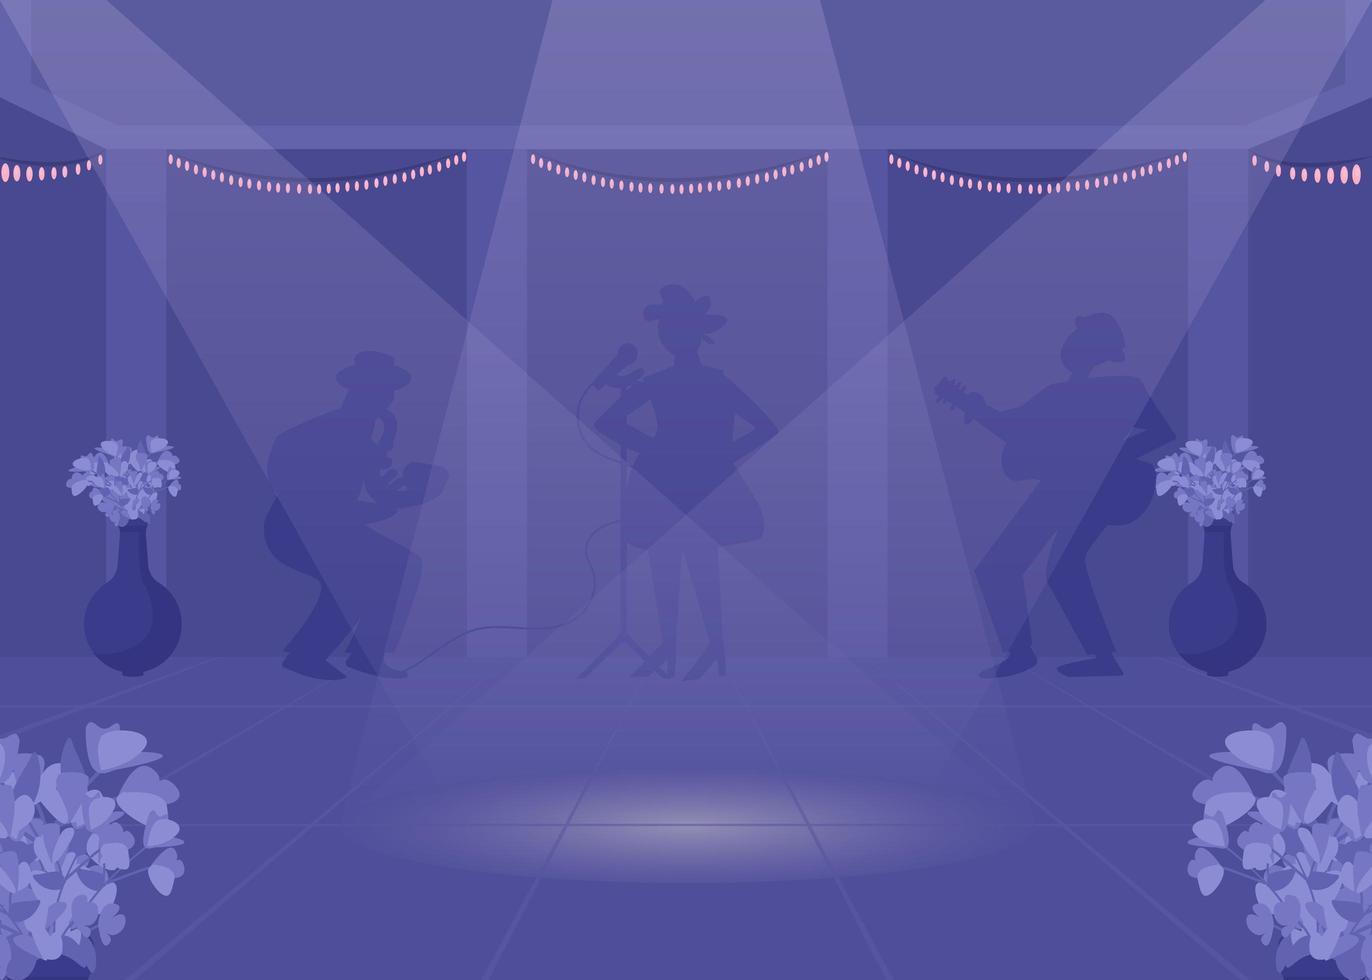 dansgolv på natten vektor